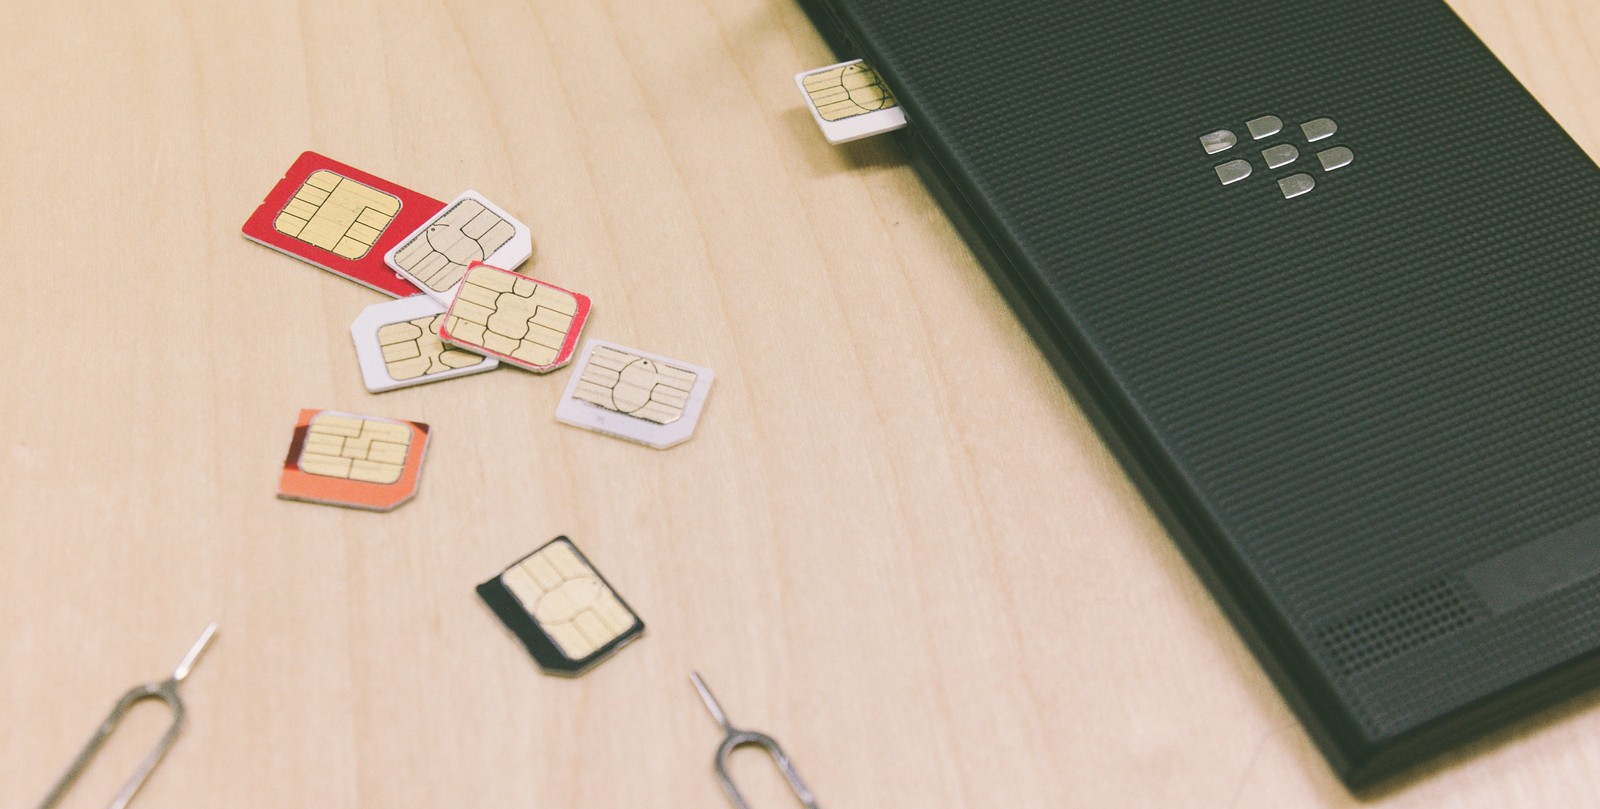 UQモバイル口座振替とOCNモバイルONE口座振替を口座振替できる商品で比較